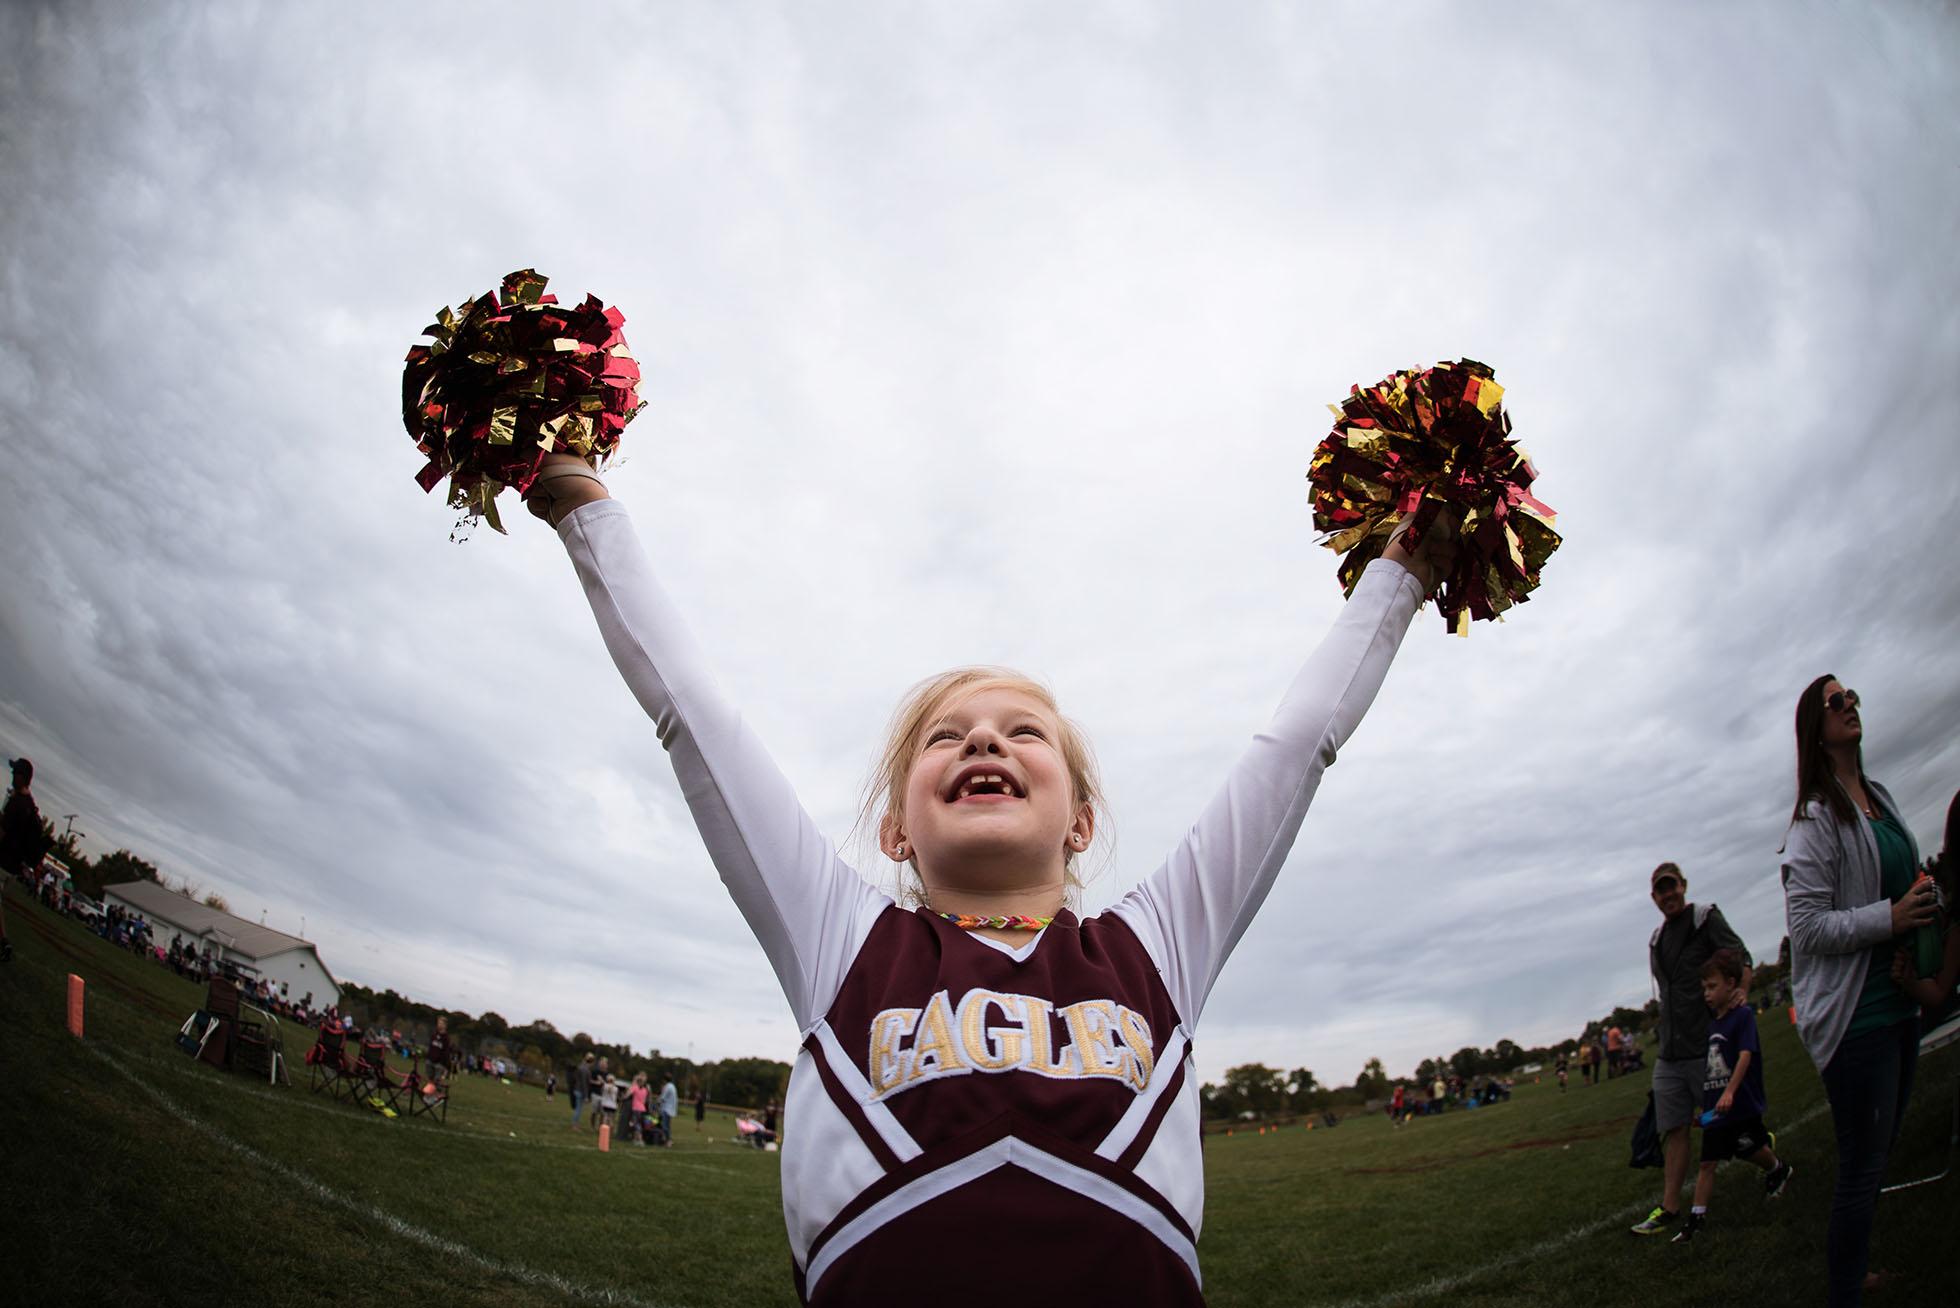 girl-cheering-at-football-game-freezing-motion-kellie-bieser